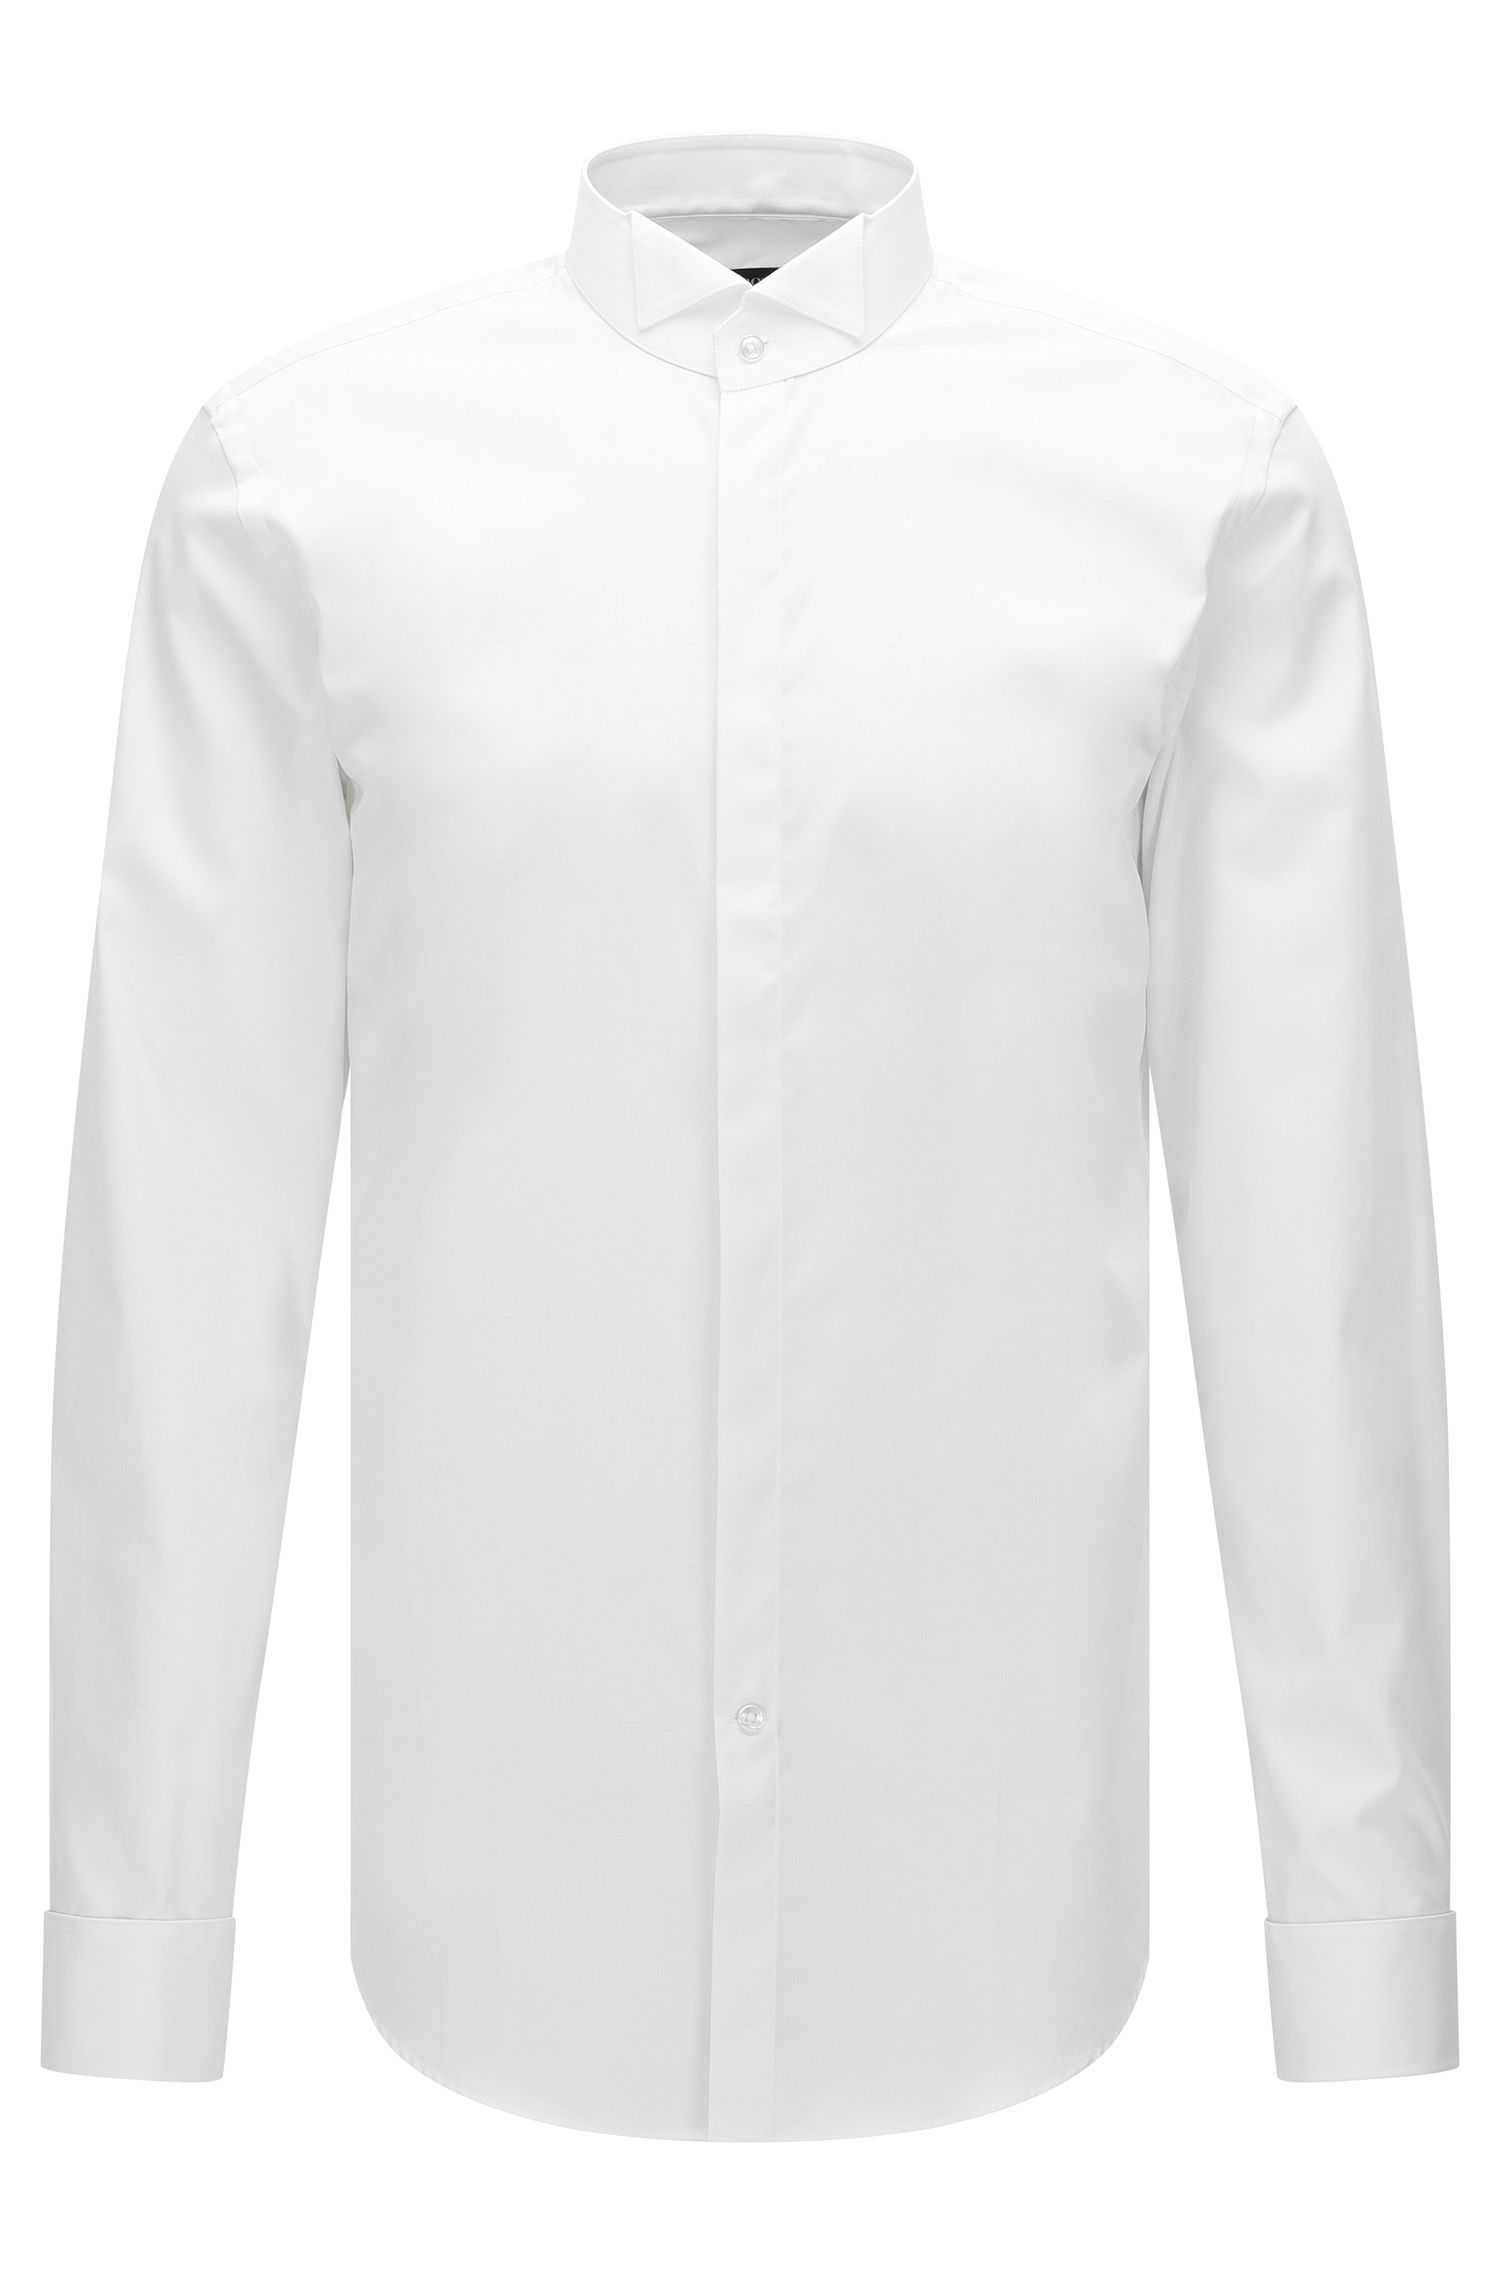 Slim-fit dress shirt in cotton with passementerie buttons: 'Jillik'